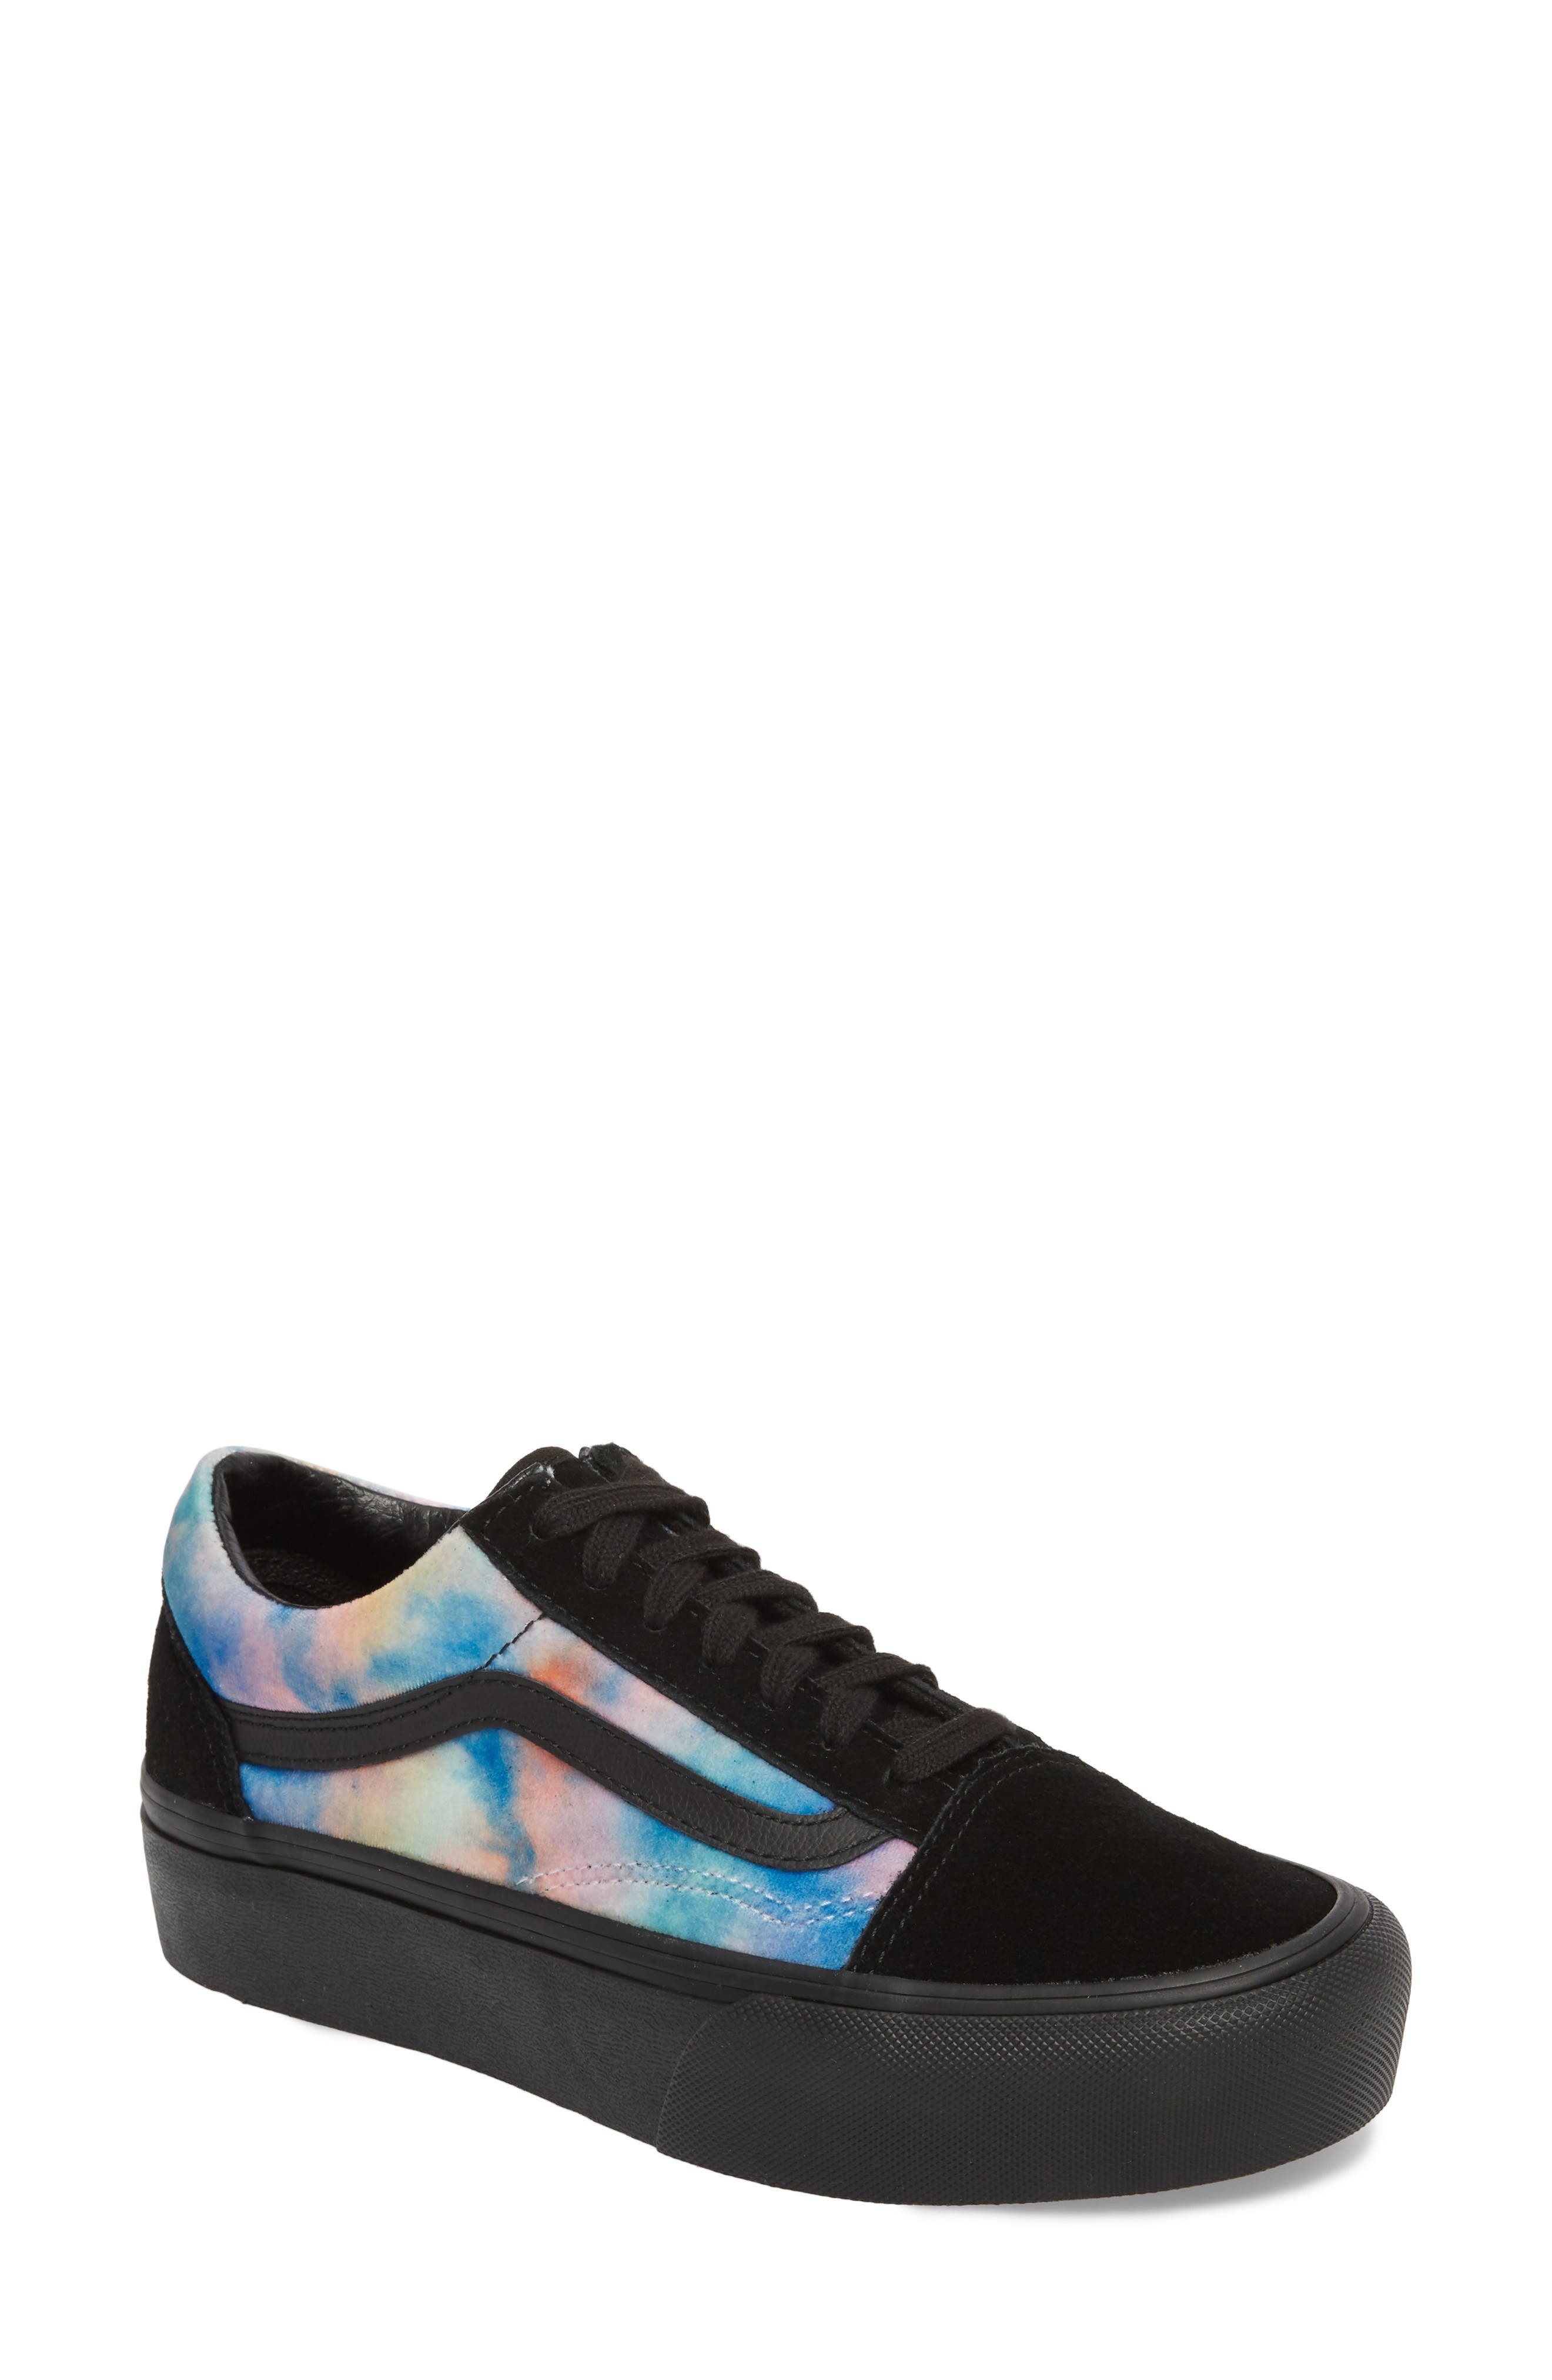 Old Skool Platform Sneaker,                         Main,                         color, Velvet Tie-Dye Multi/ Black